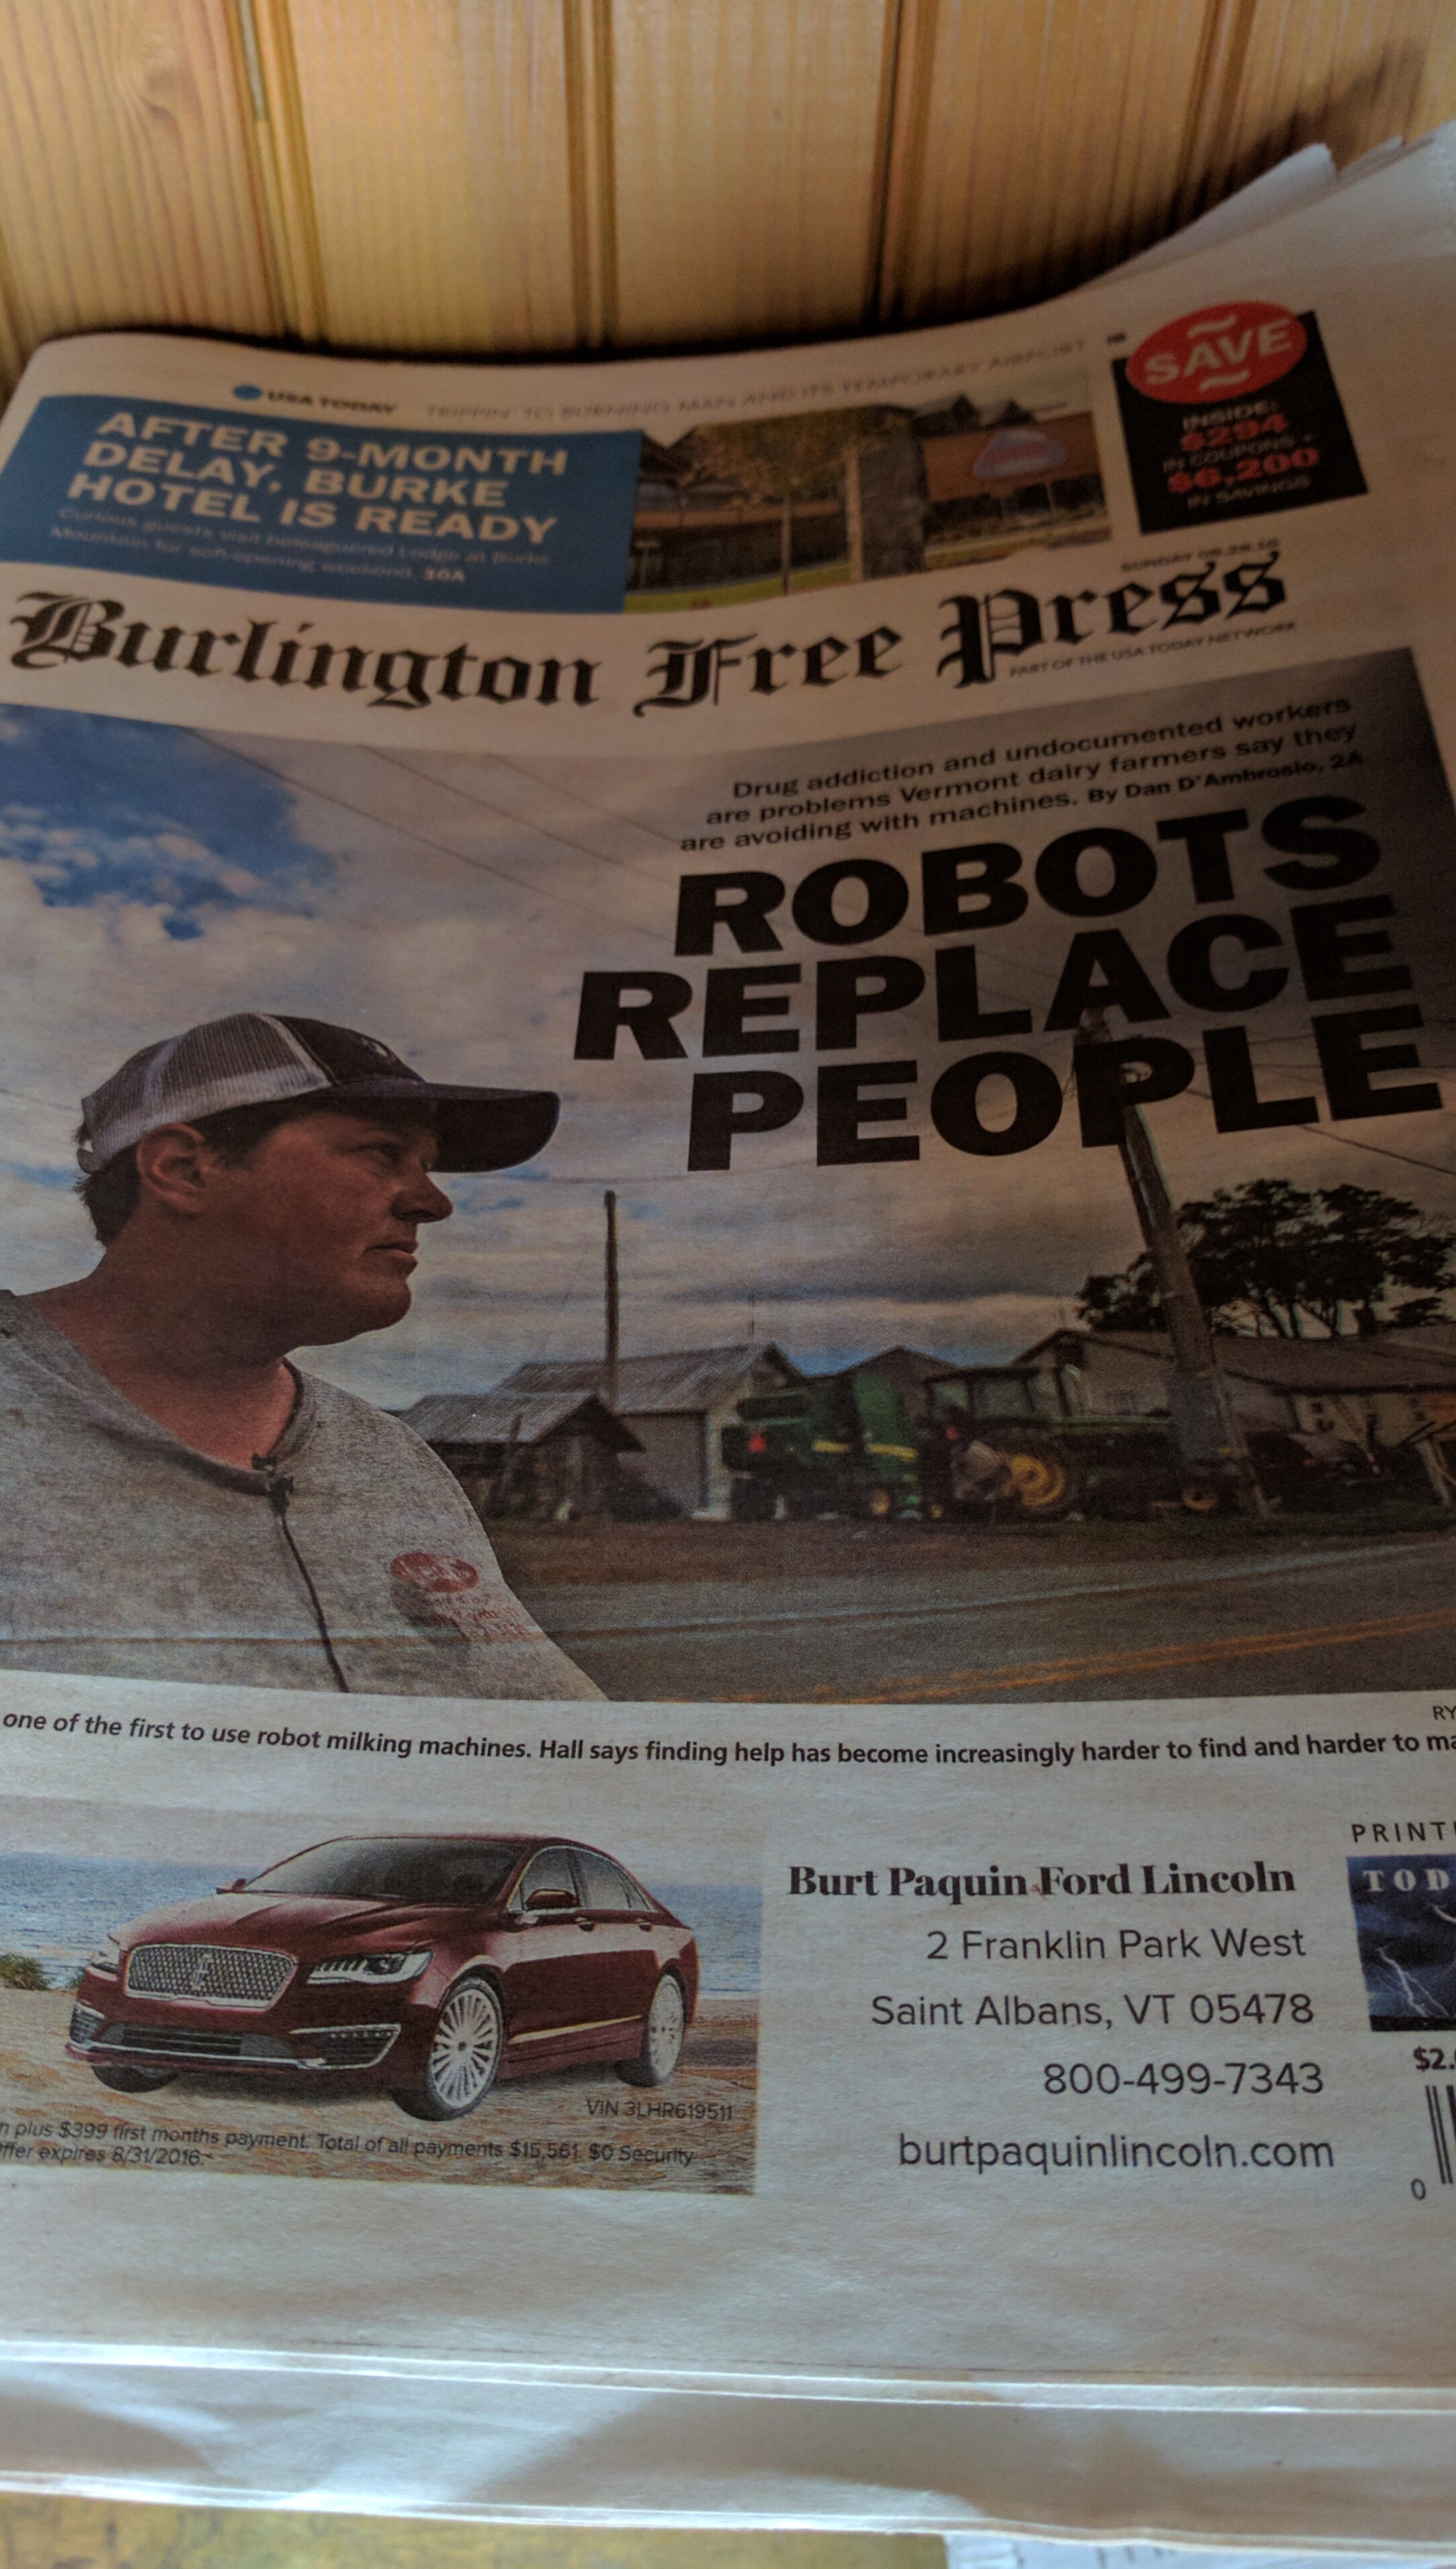 robots-replace-people.jpg